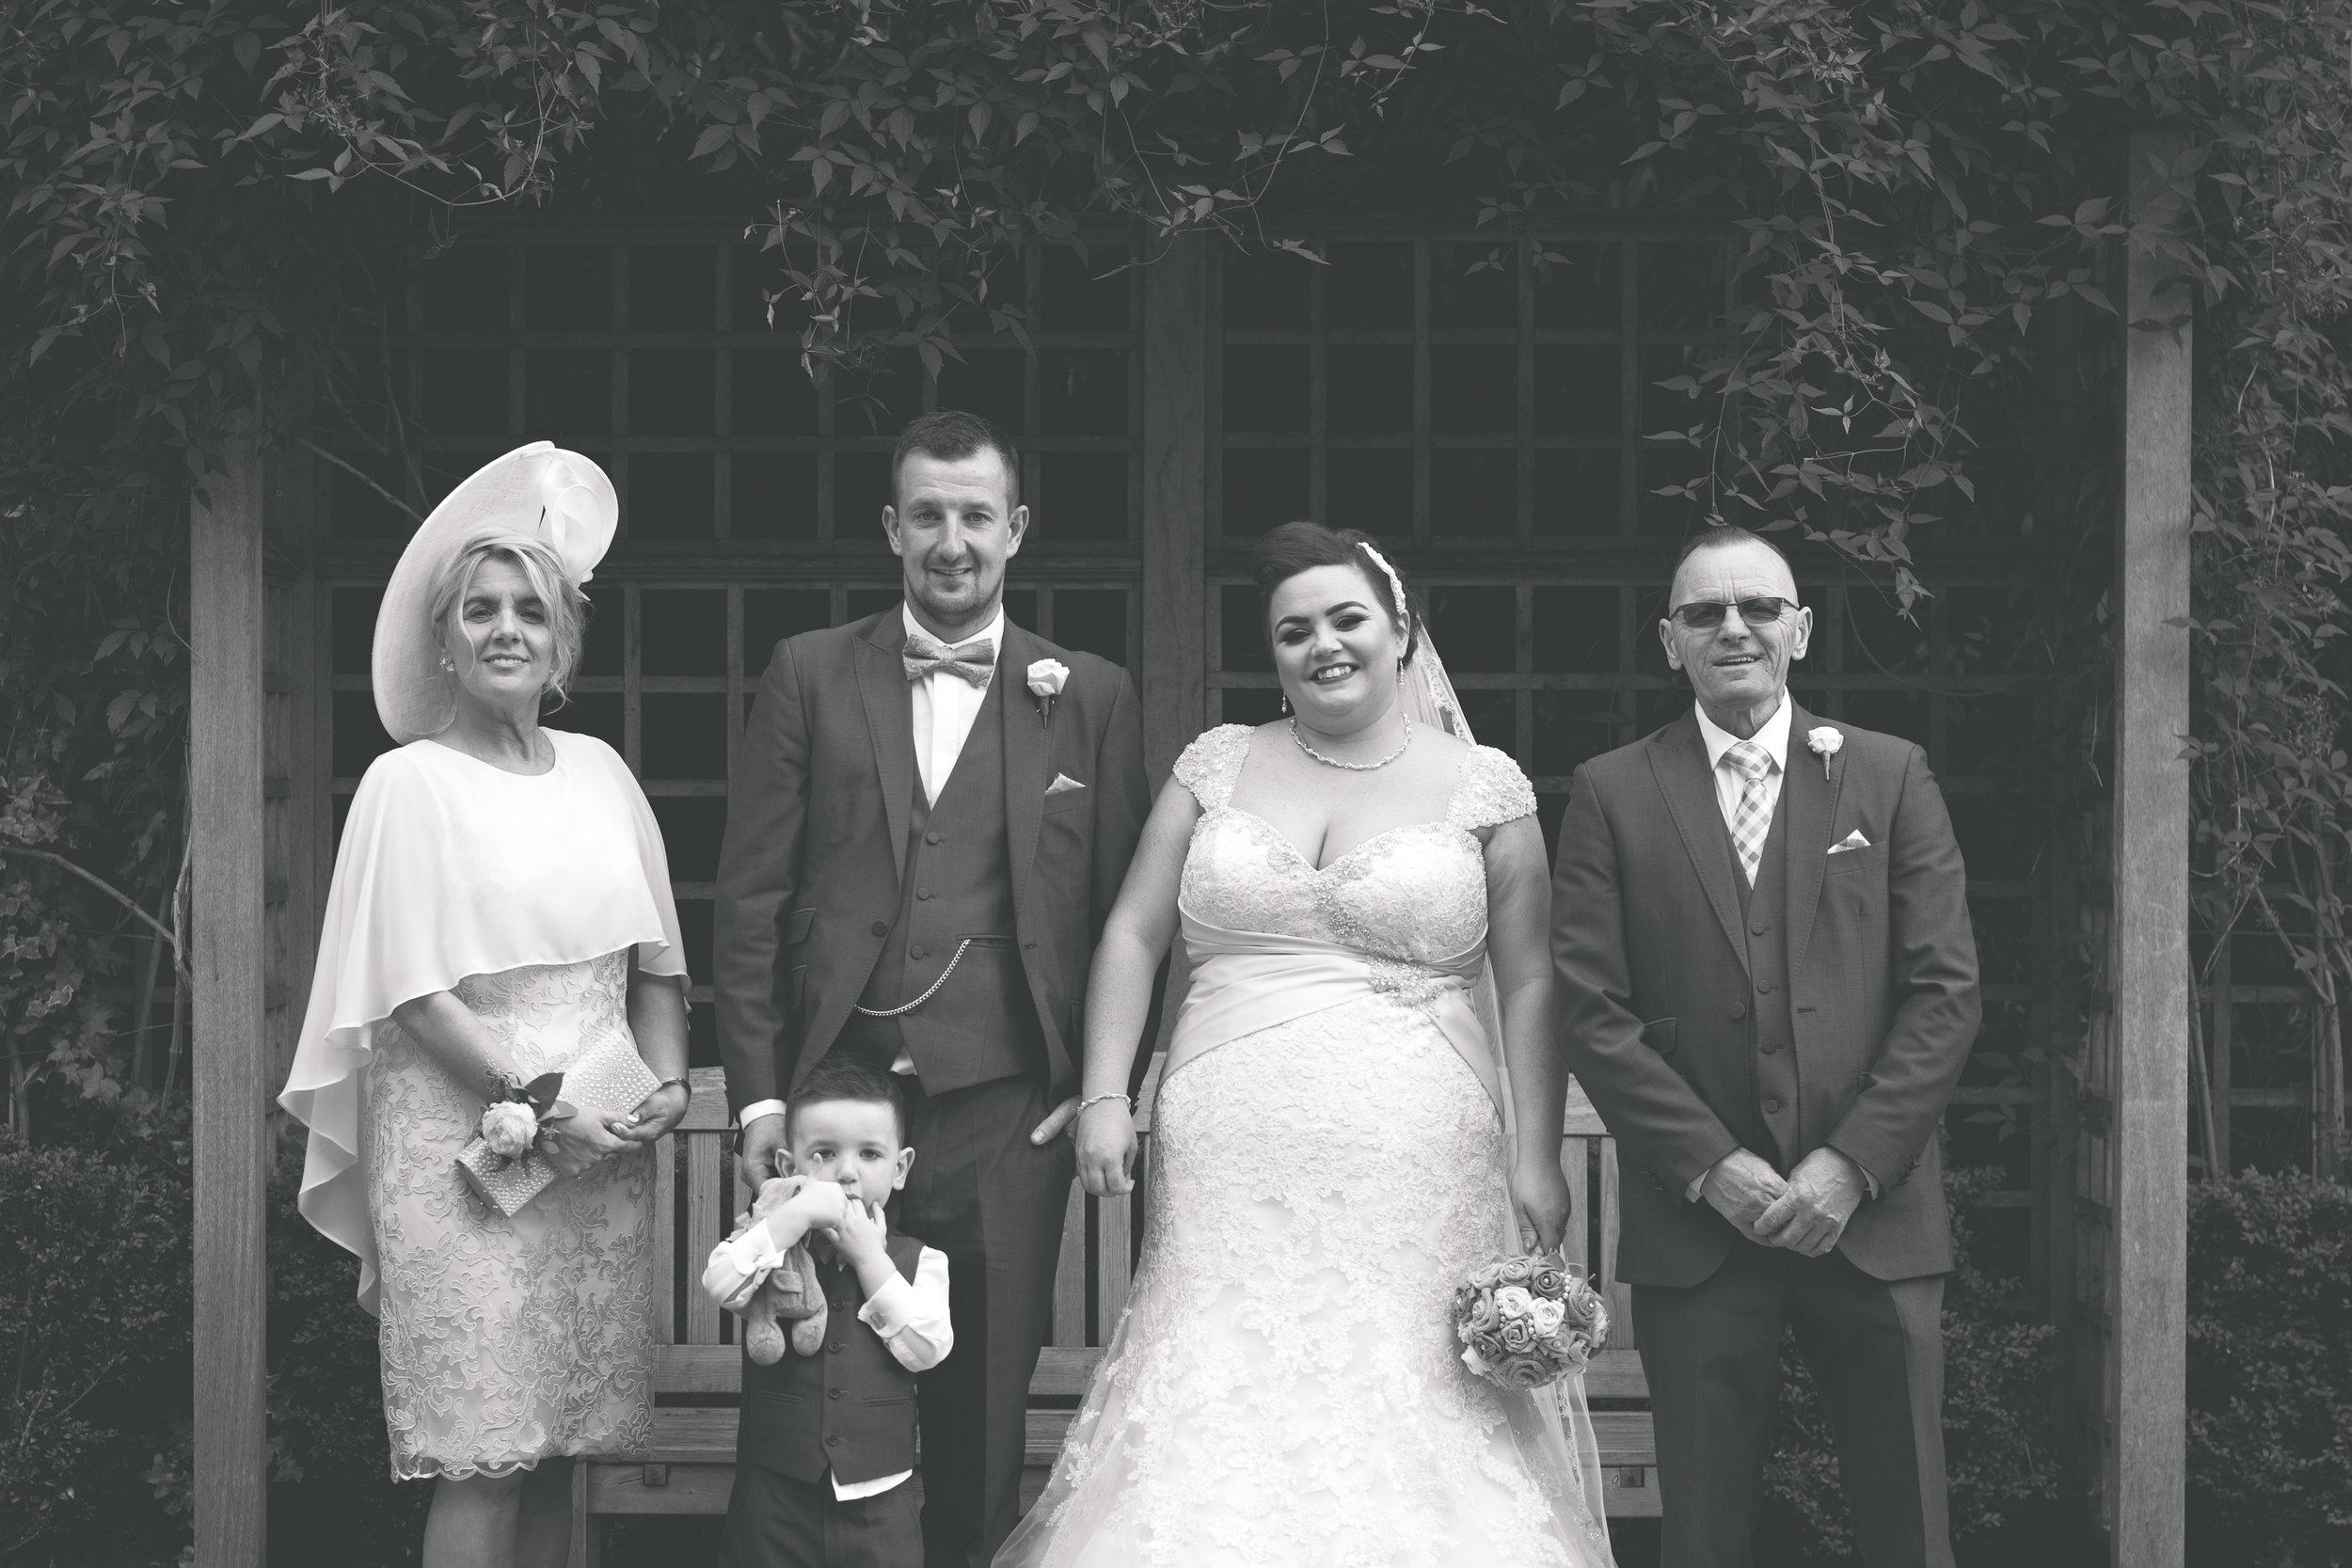 Antoinette & Stephen - Portraits   Brian McEwan Photography   Wedding Photographer Northern Ireland 53.jpg